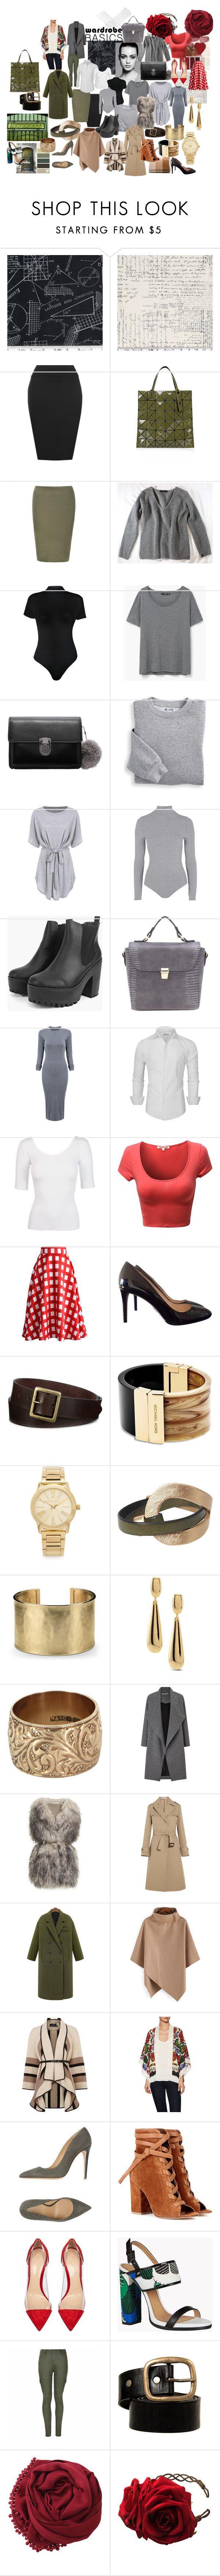 """Vintage Basics"" by supersilent on Polyvore featuring moda, Trowbridge, WearAll, Bao Bao by Issey Miyake, CO, MANGO, Blair, Topshop, Chicwish i Prada"